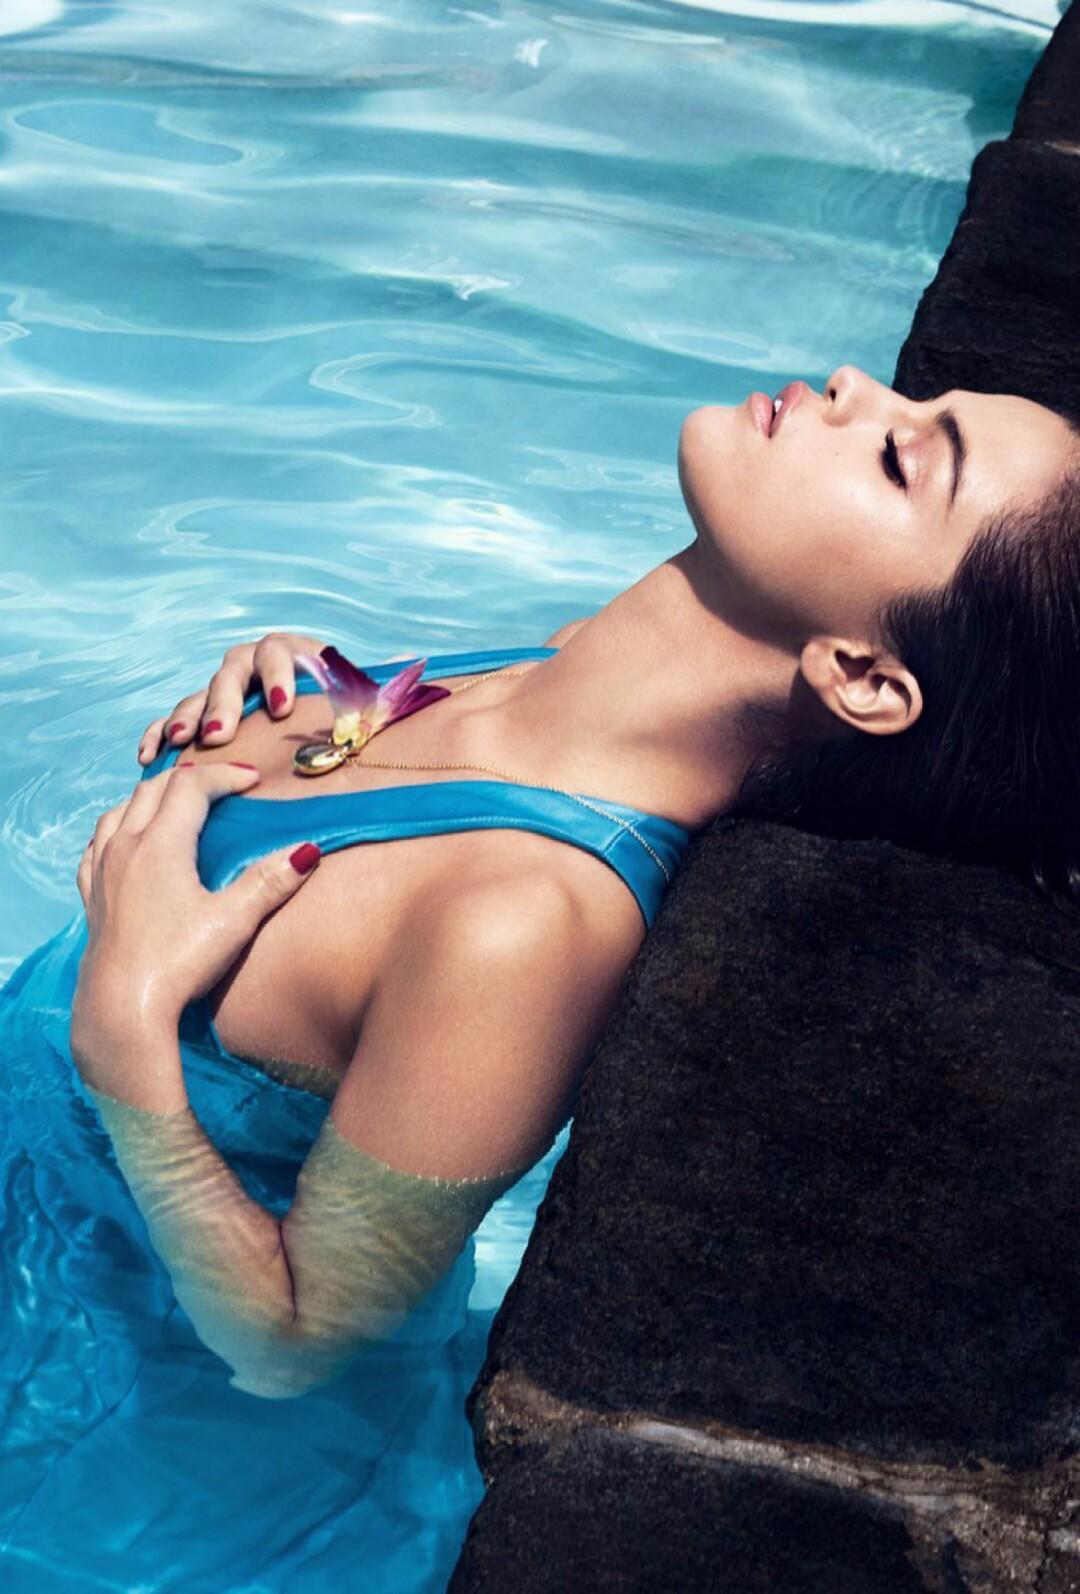 Selena Gomez latest hot photoshoot 2017 hd - Beautiful Actress